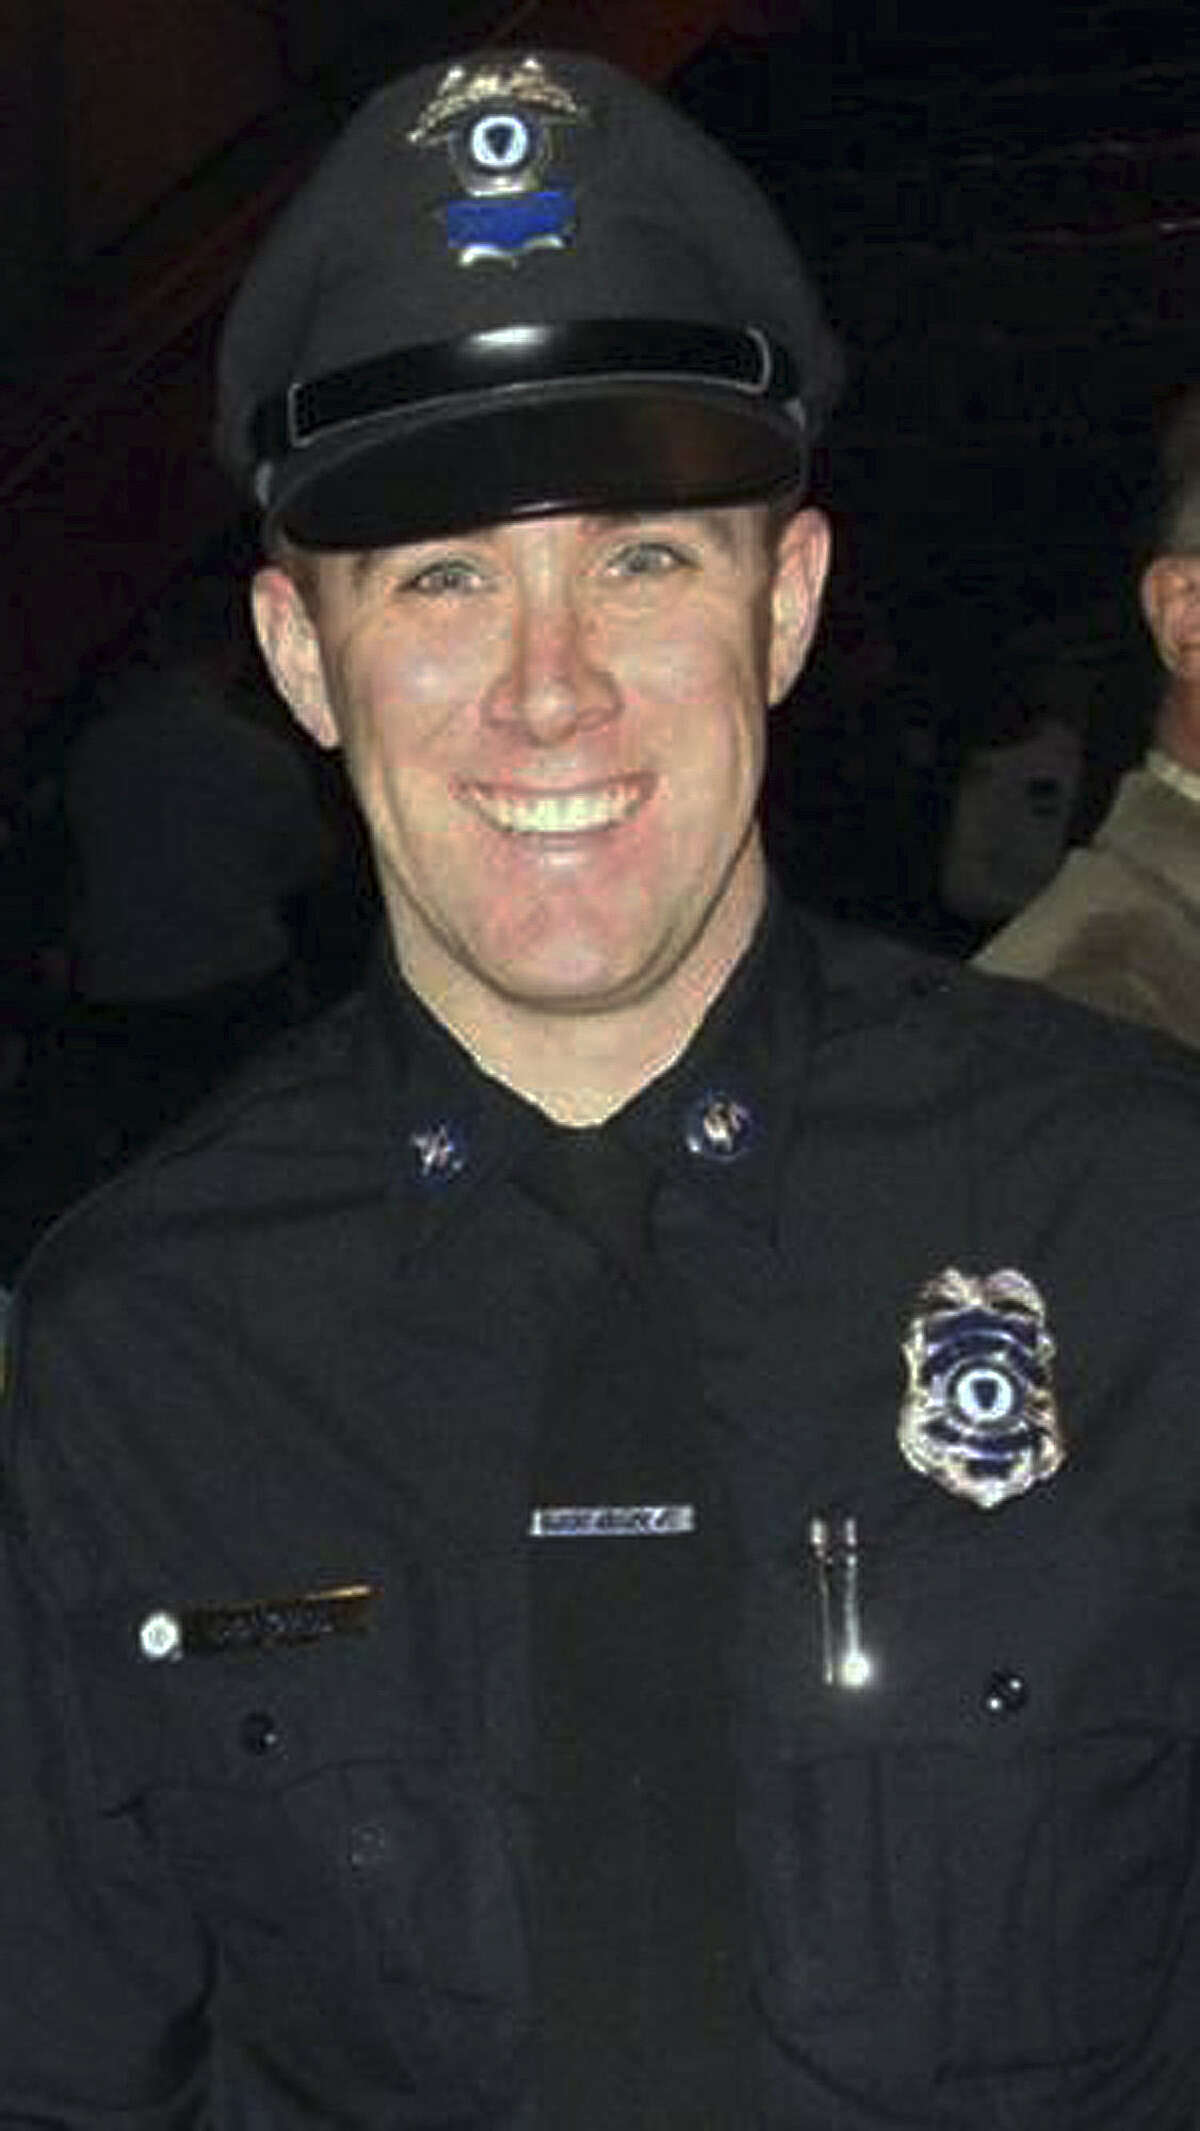 MBTA officer Richard Donohue, 33, was seriously injured early Friday morning.